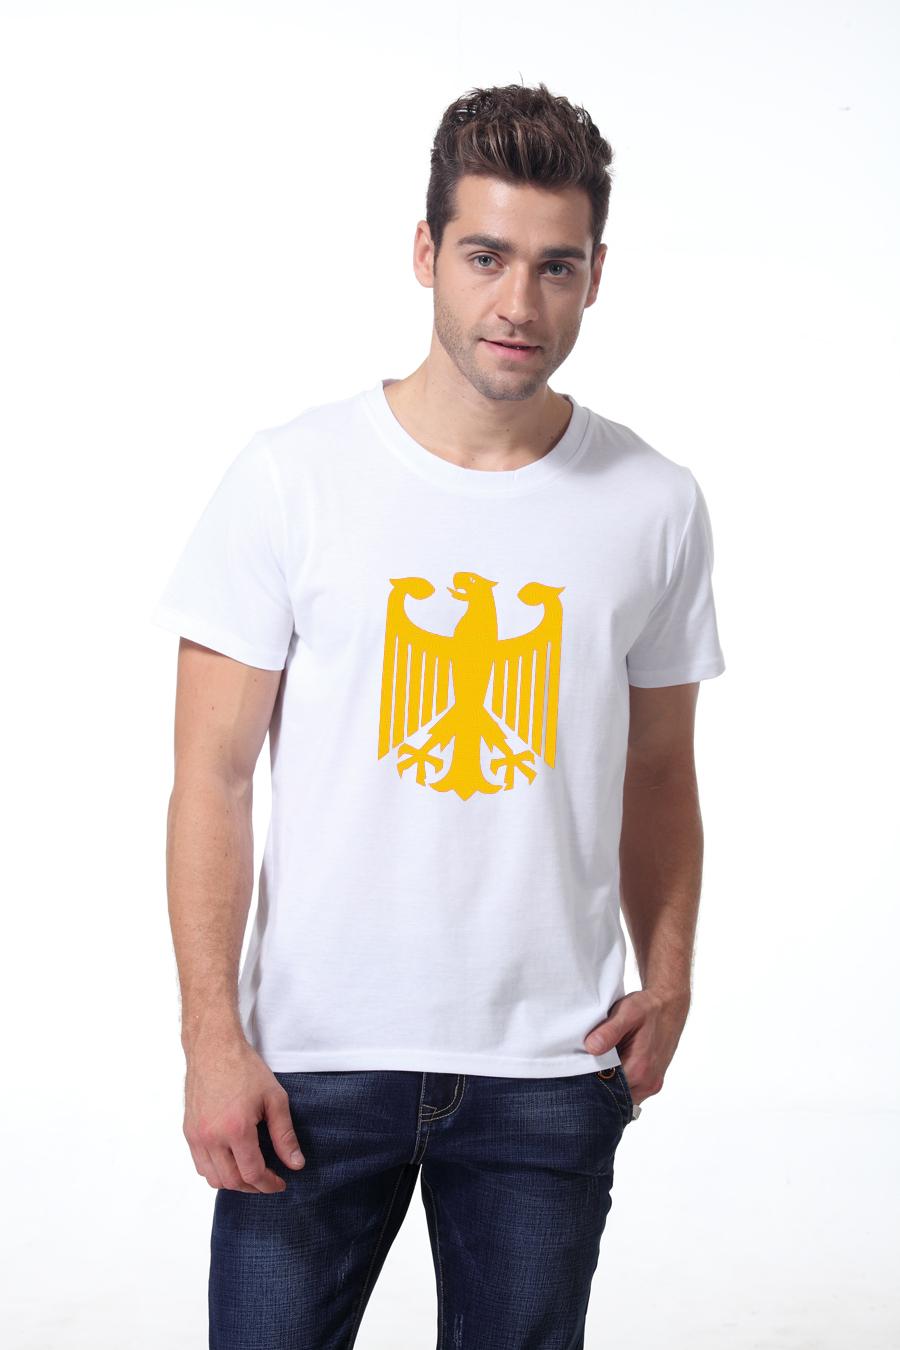 German Army Eagle Bundeswehr Popular T Shirt Bodybuilding ...